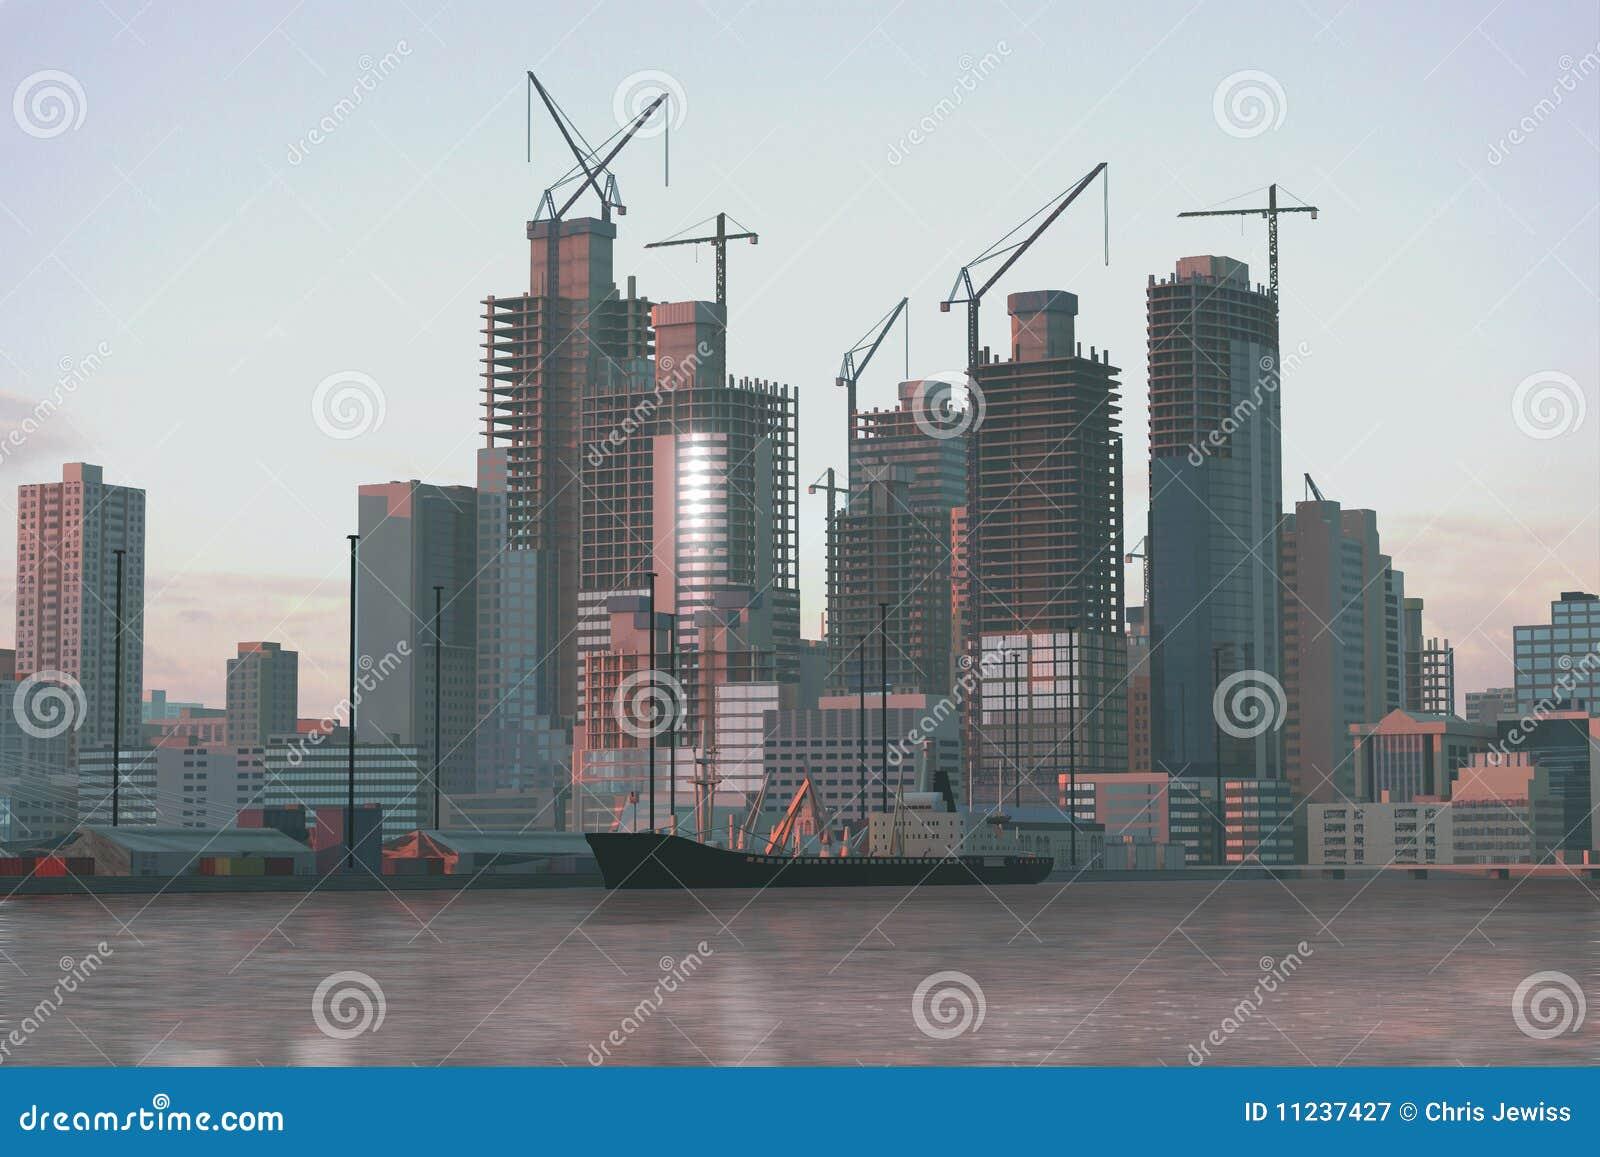 Modern City Under Construction Stock Illustration ... |City Under Construction